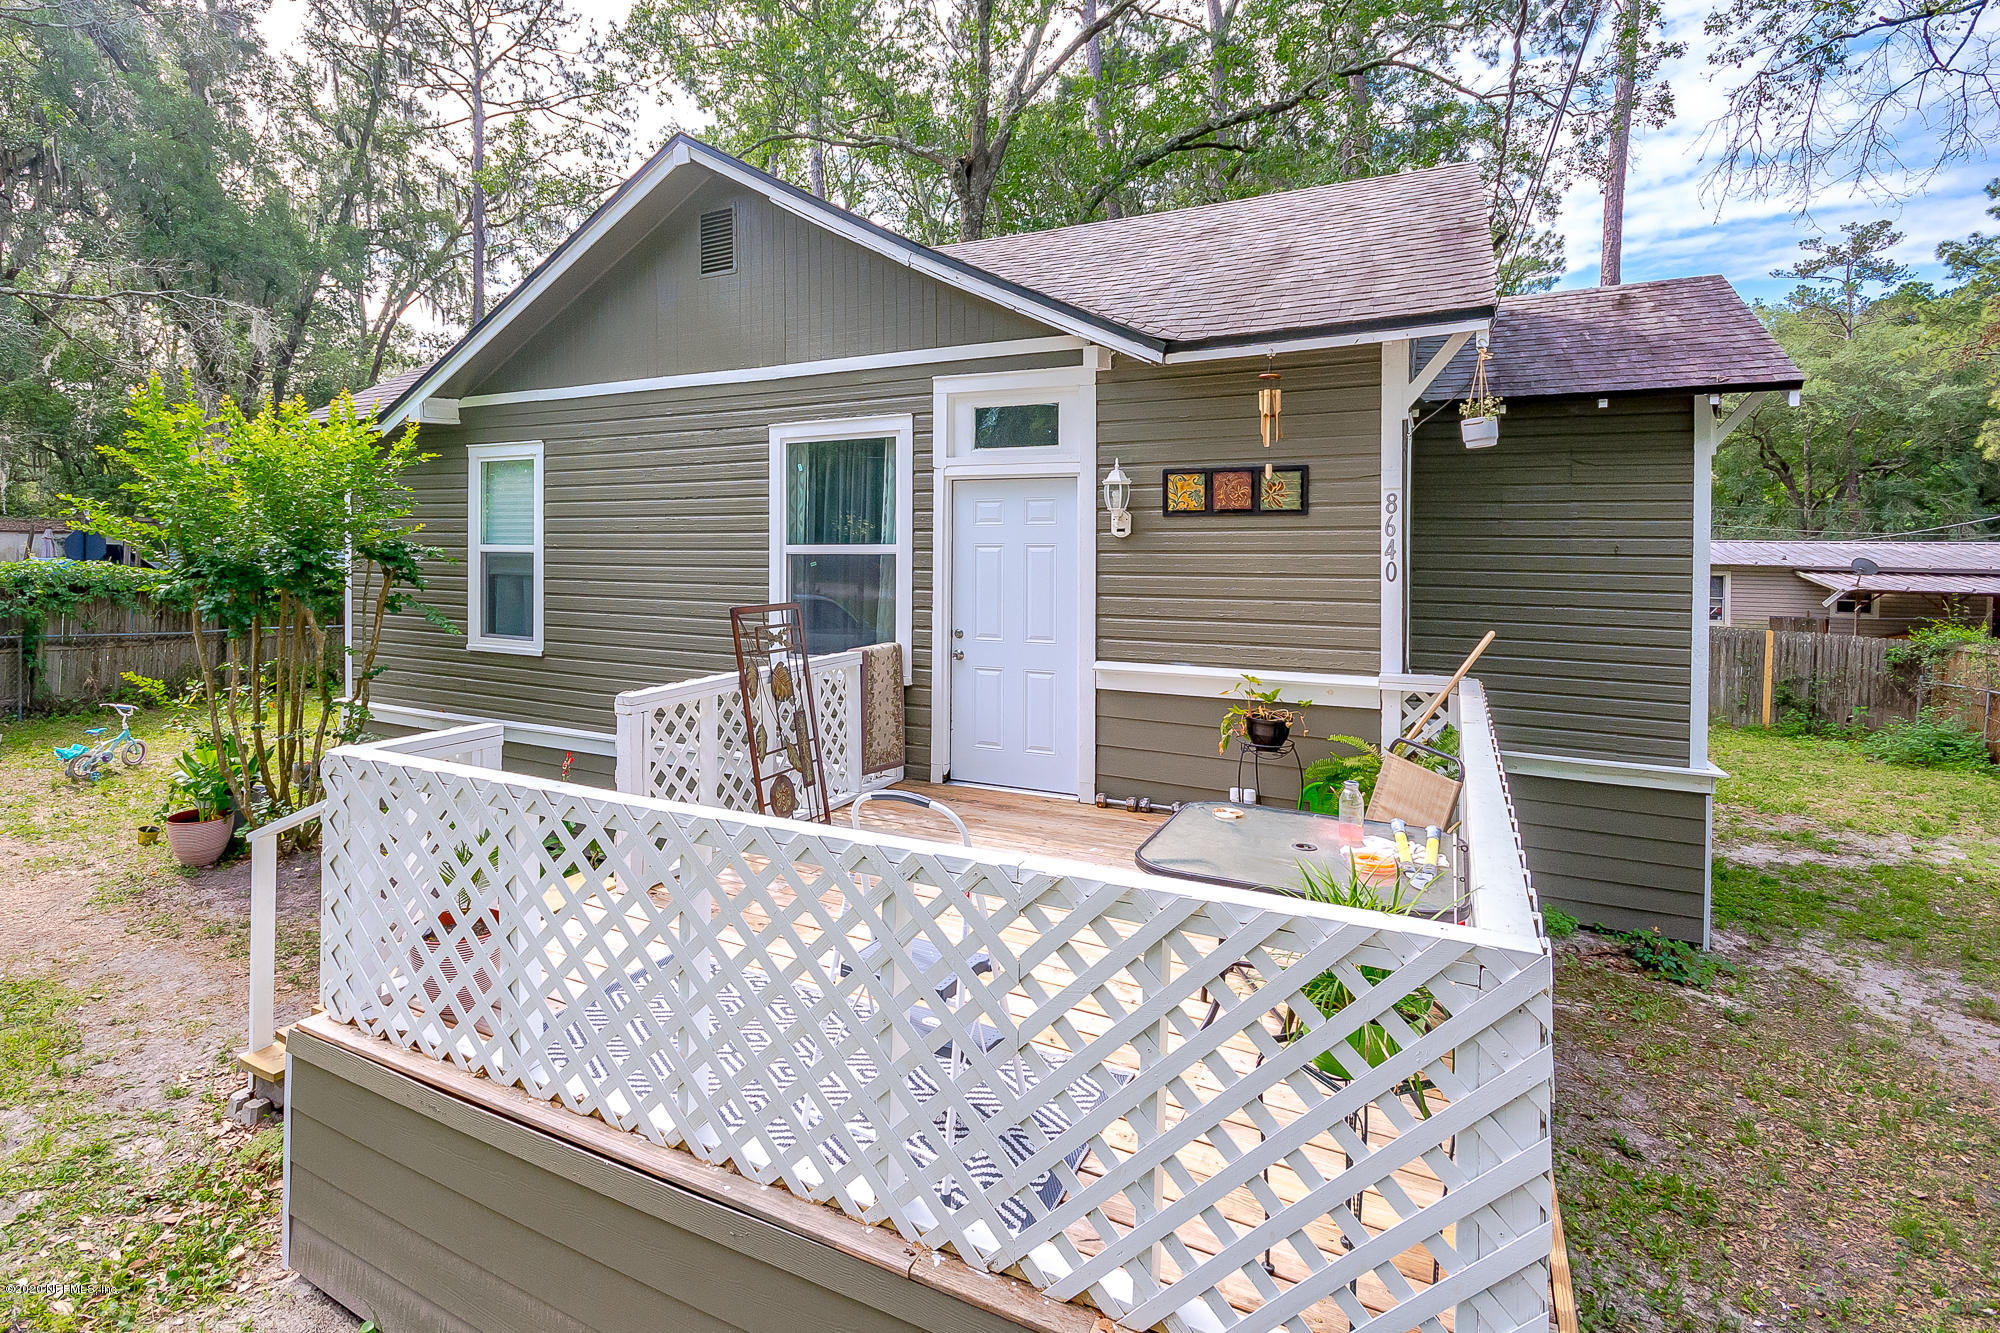 8640 SUSIE, JACKSONVILLE, FLORIDA 32210, 3 Bedrooms Bedrooms, ,1 BathroomBathrooms,Investment / MultiFamily,For sale,SUSIE,1053952